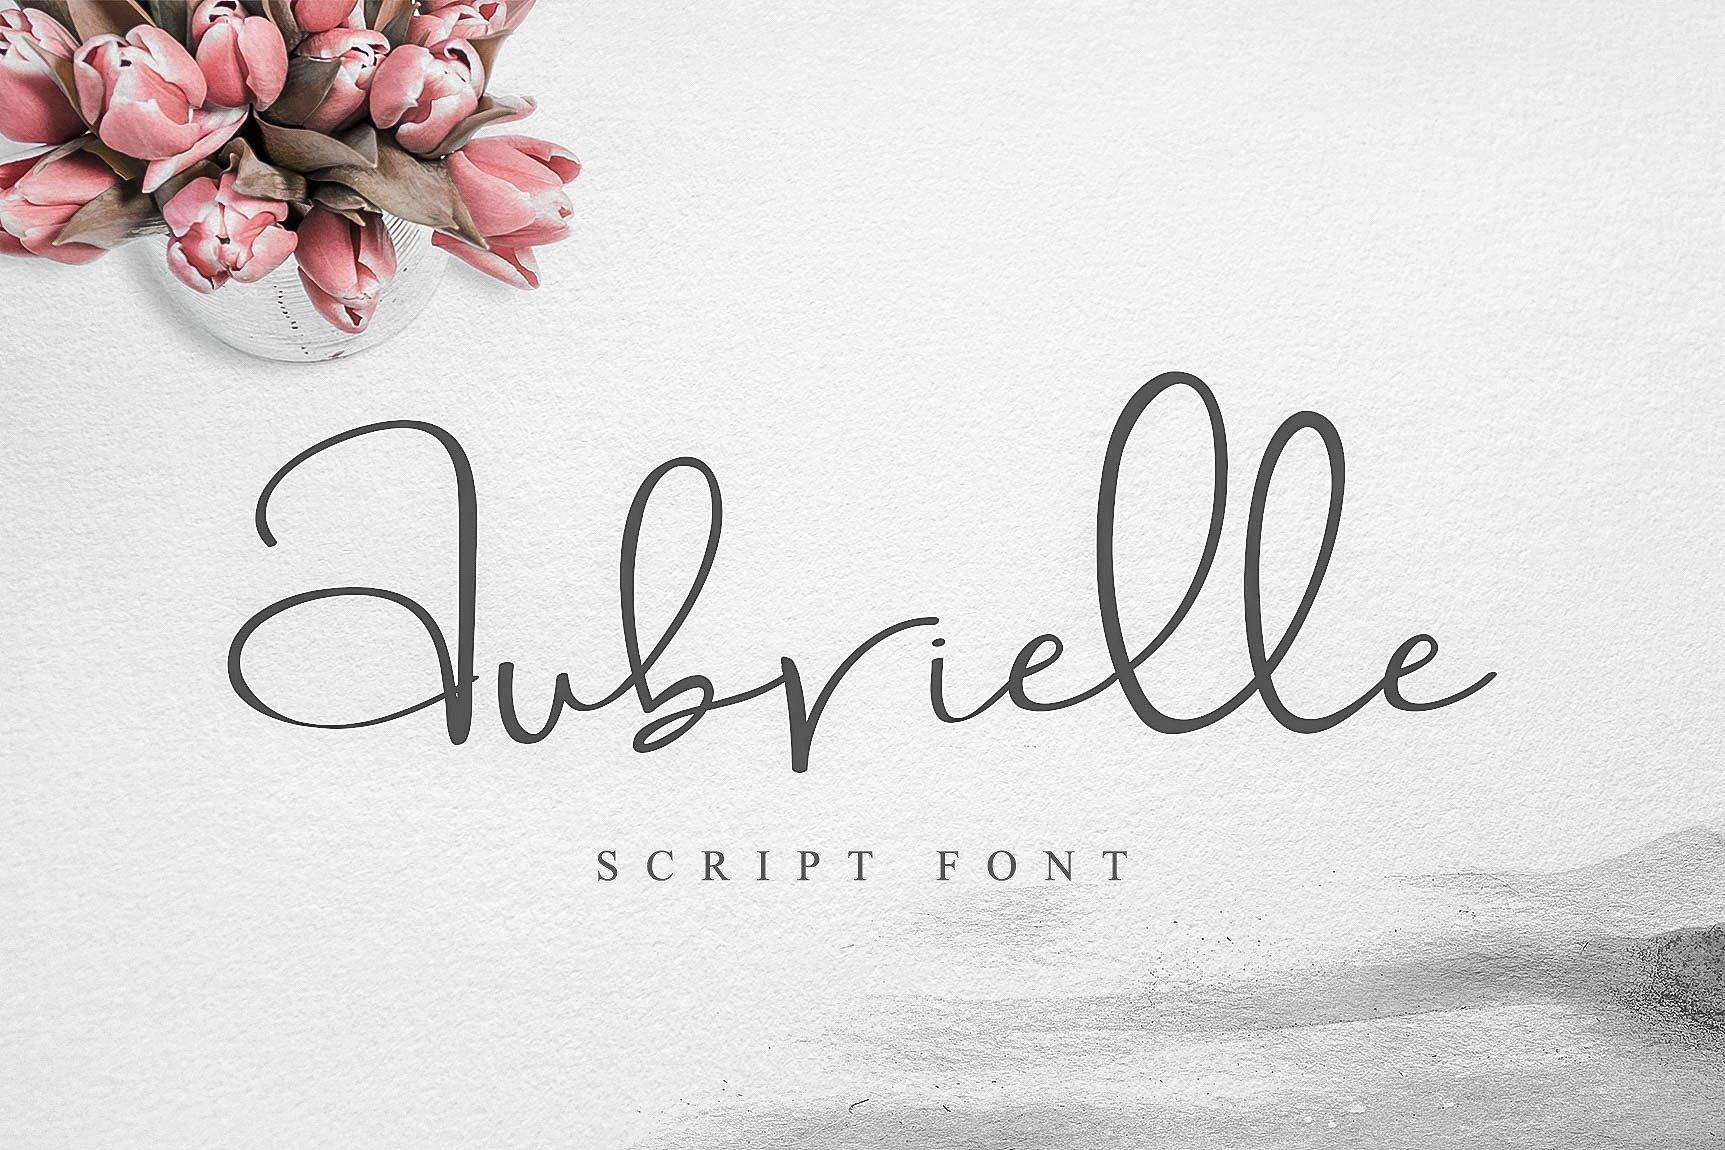 https://fontclarity.com/wp-content/uploads/2019/09/aubrielle-script-font-download-0.jpg Free Download